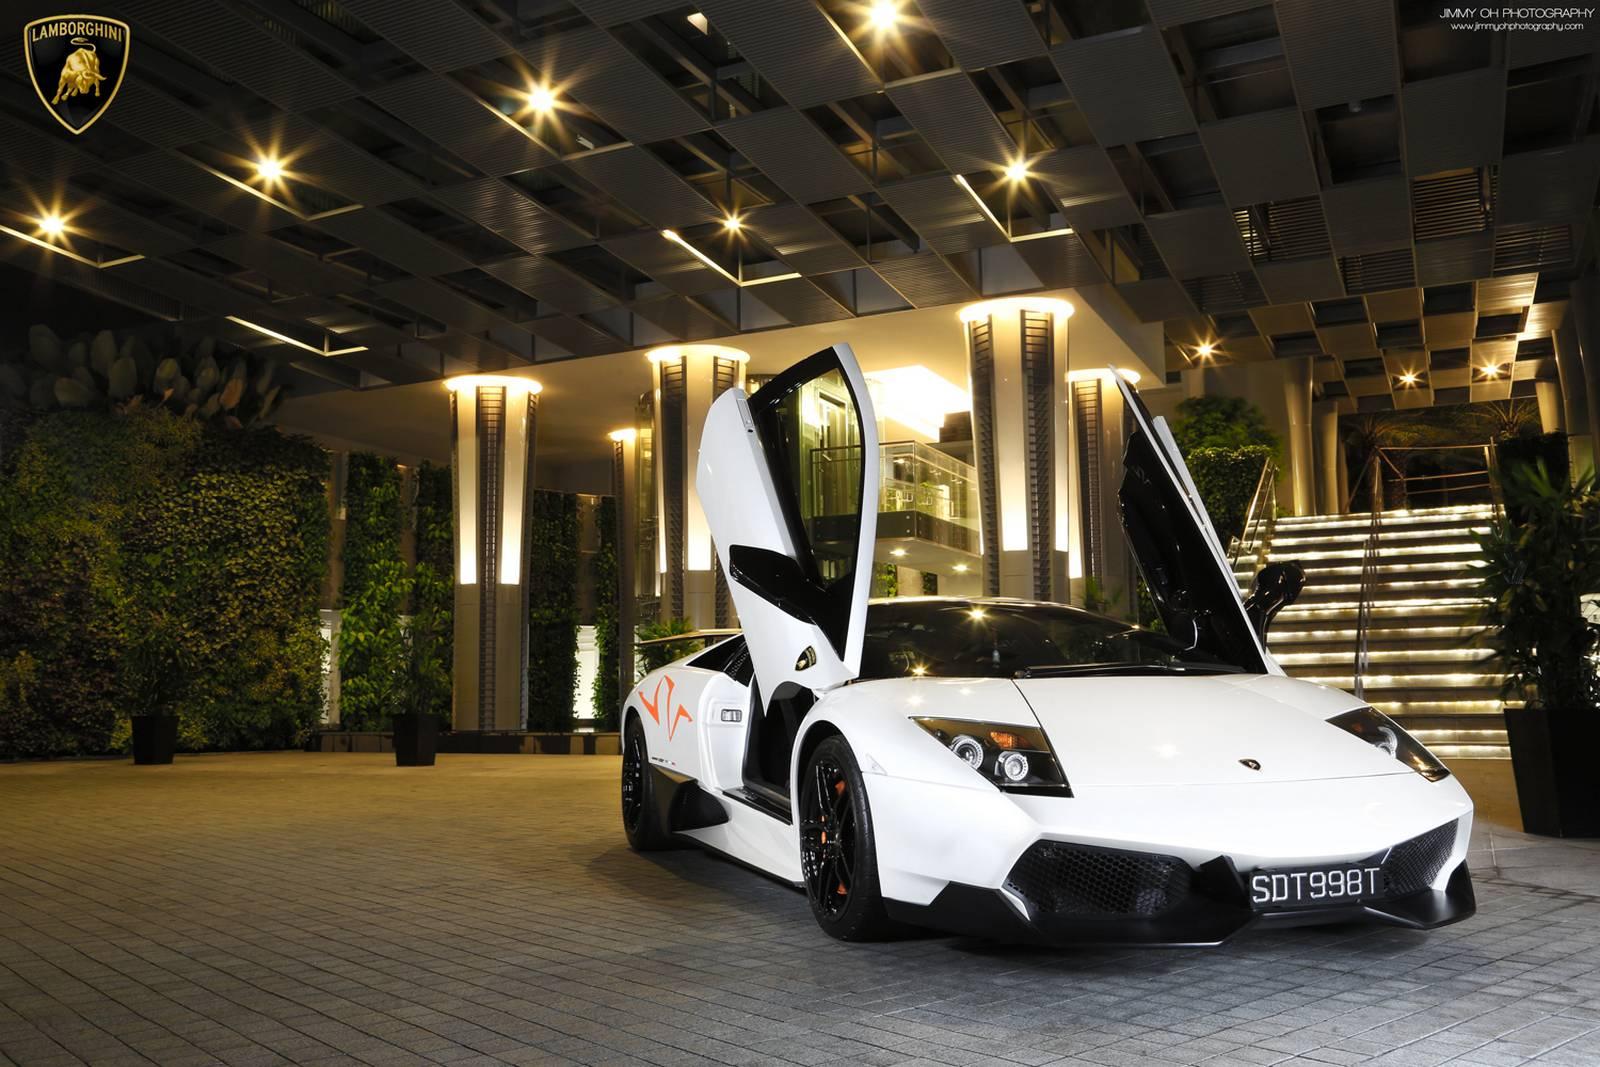 White Lamborghini Murcielago Lp670 4 Sv Photoshoot Gtspirit